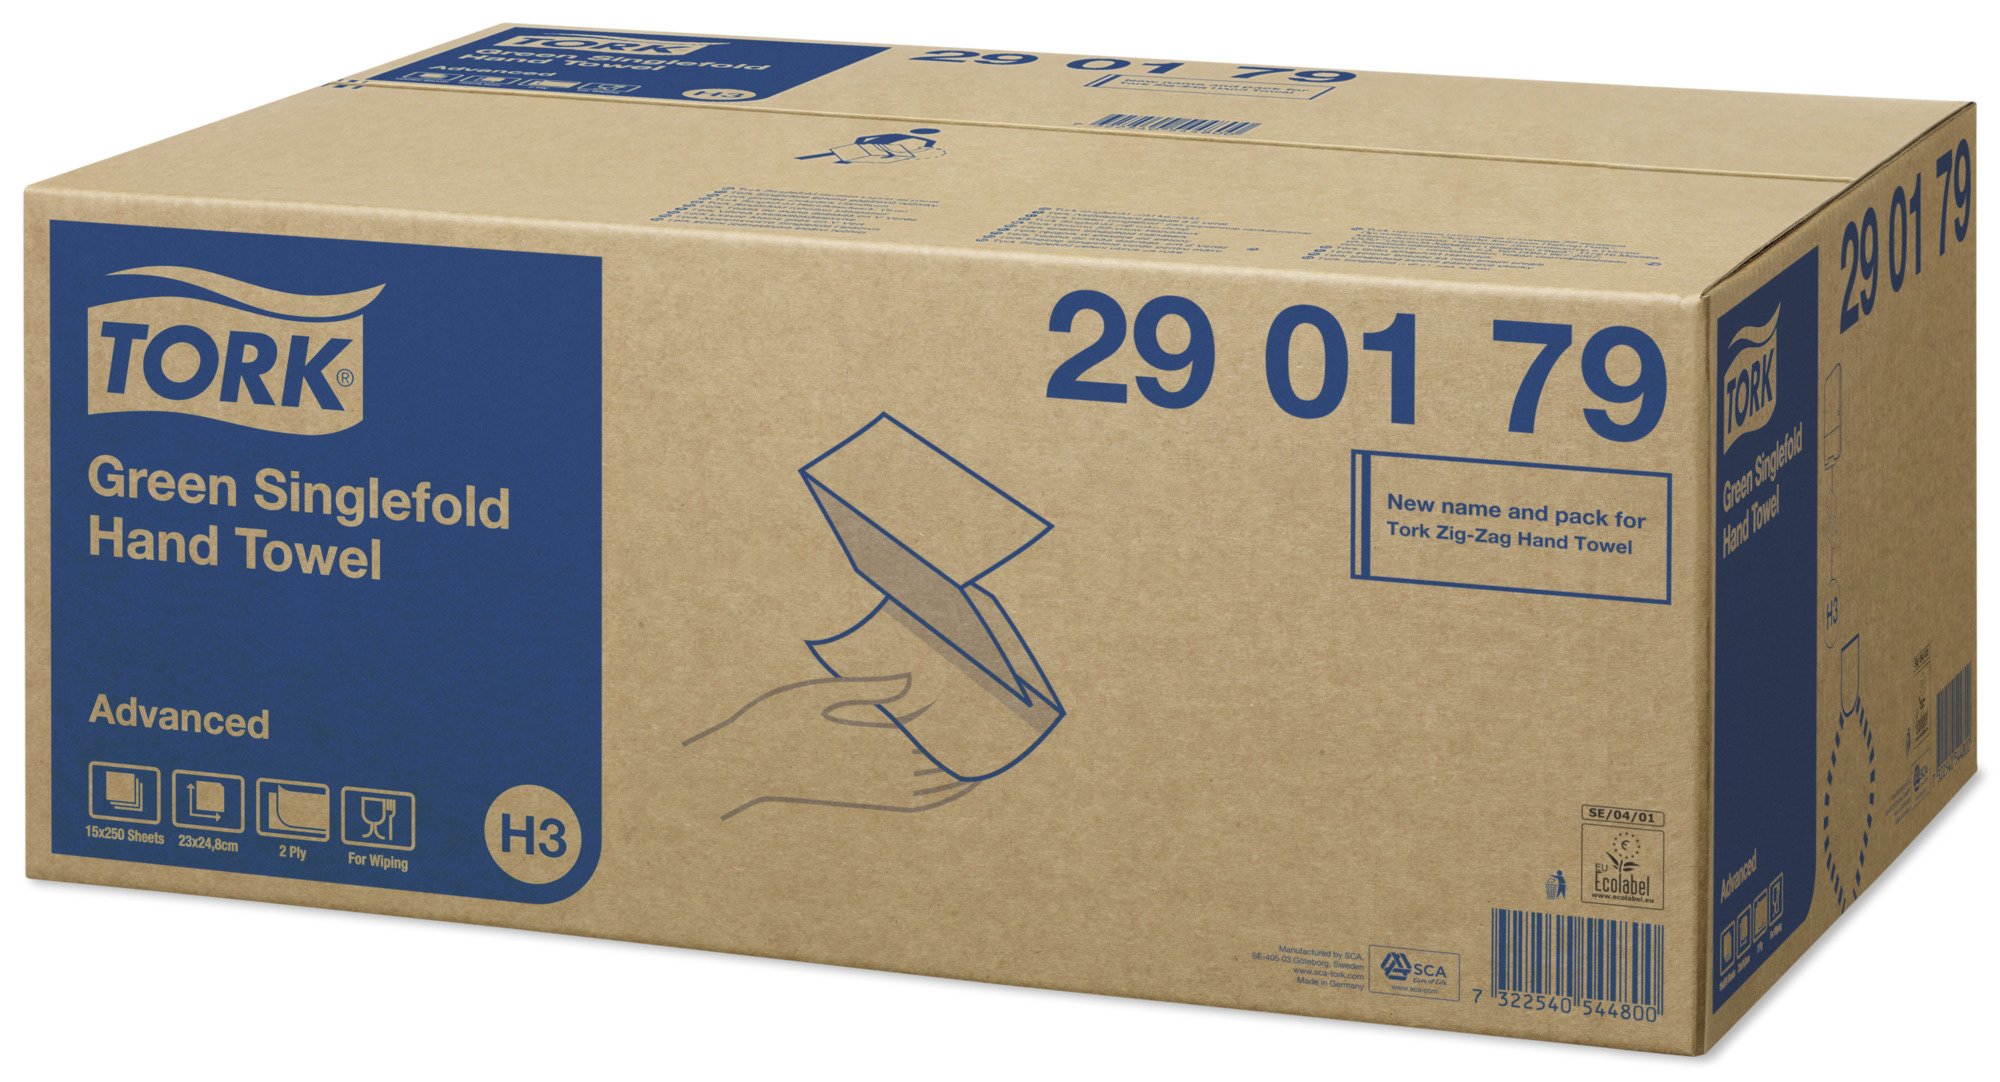 Полотенца листовые ZZ(C)-складка 2-сл., 250 лист.(24,8*11,5см.) Advanced, (H3), салат. Tork - фото 2